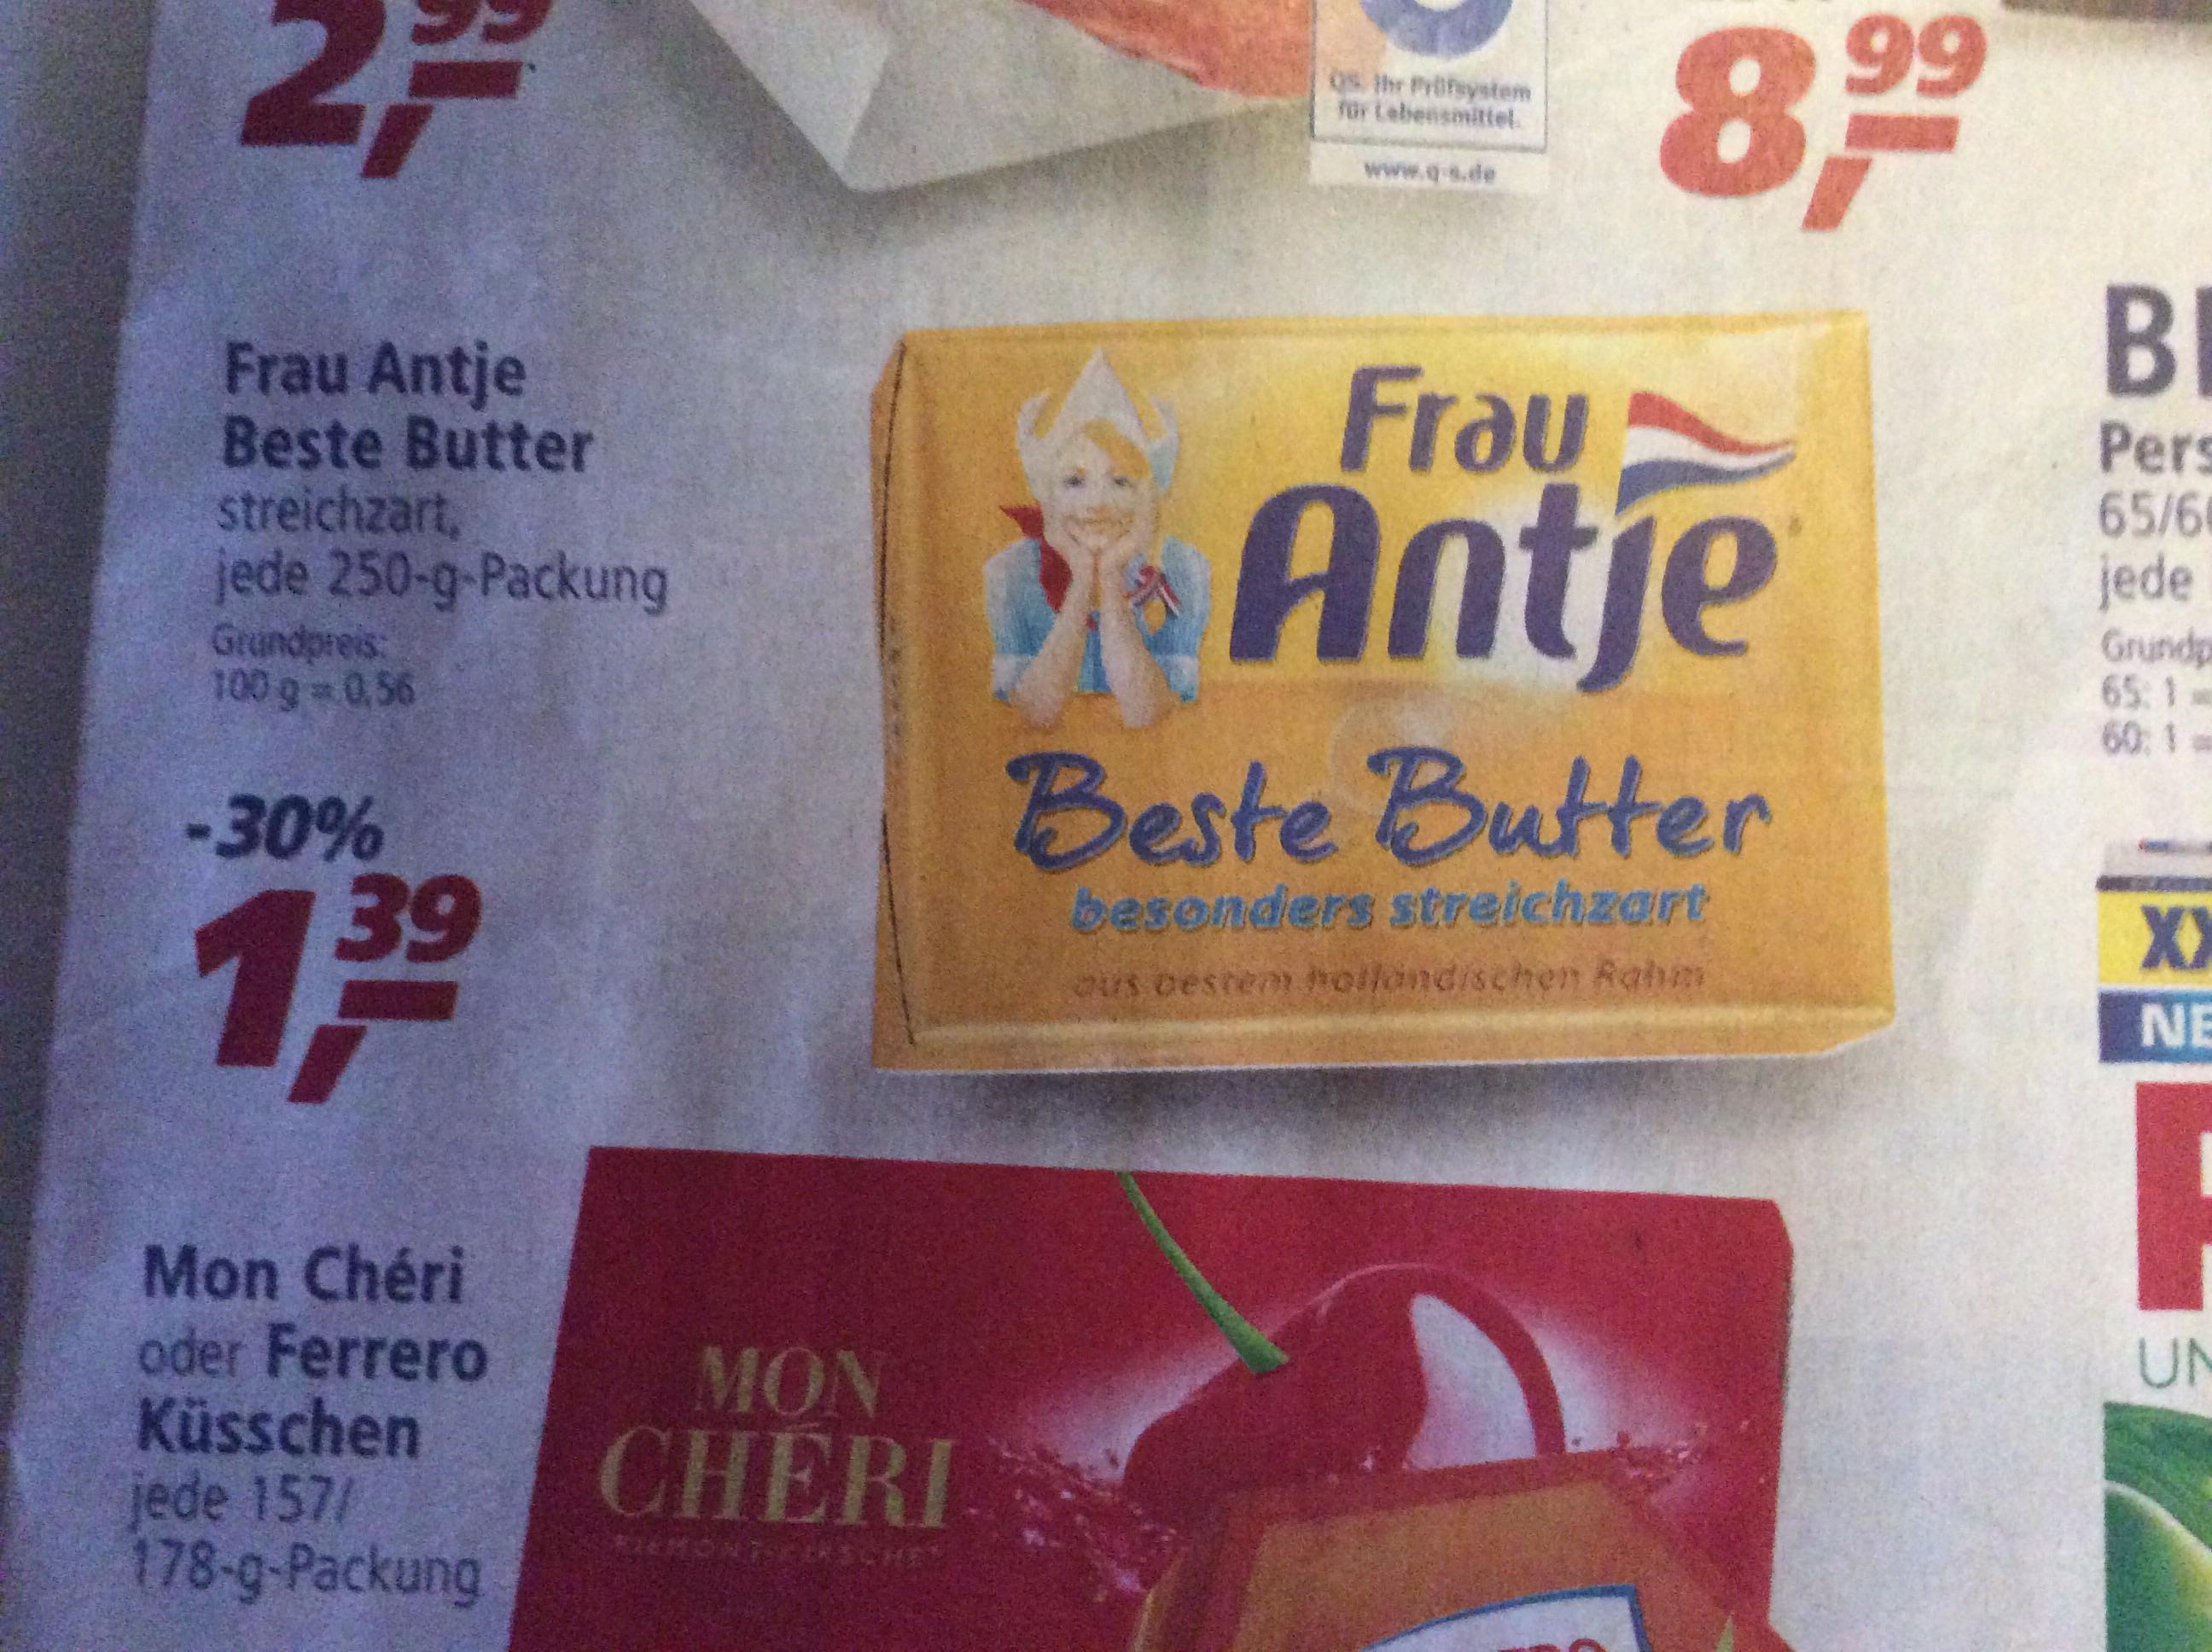 Frau Antje Beste Butter (Real offline)